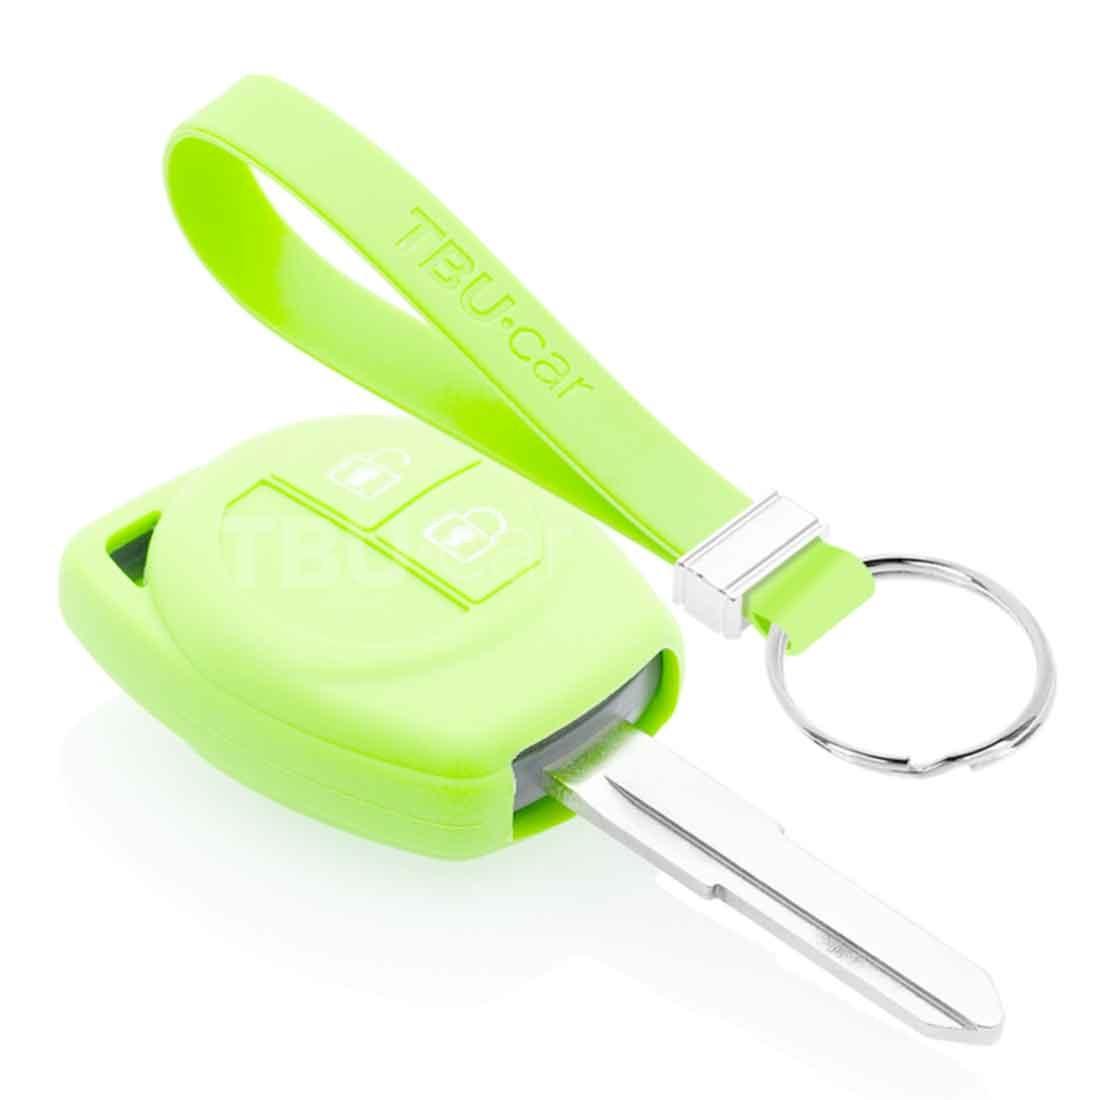 TBU car TBU car Sleutel cover compatibel met Suzuki - Silicone sleutelhoesje - beschermhoesje autosleutel - Glow in the Dark